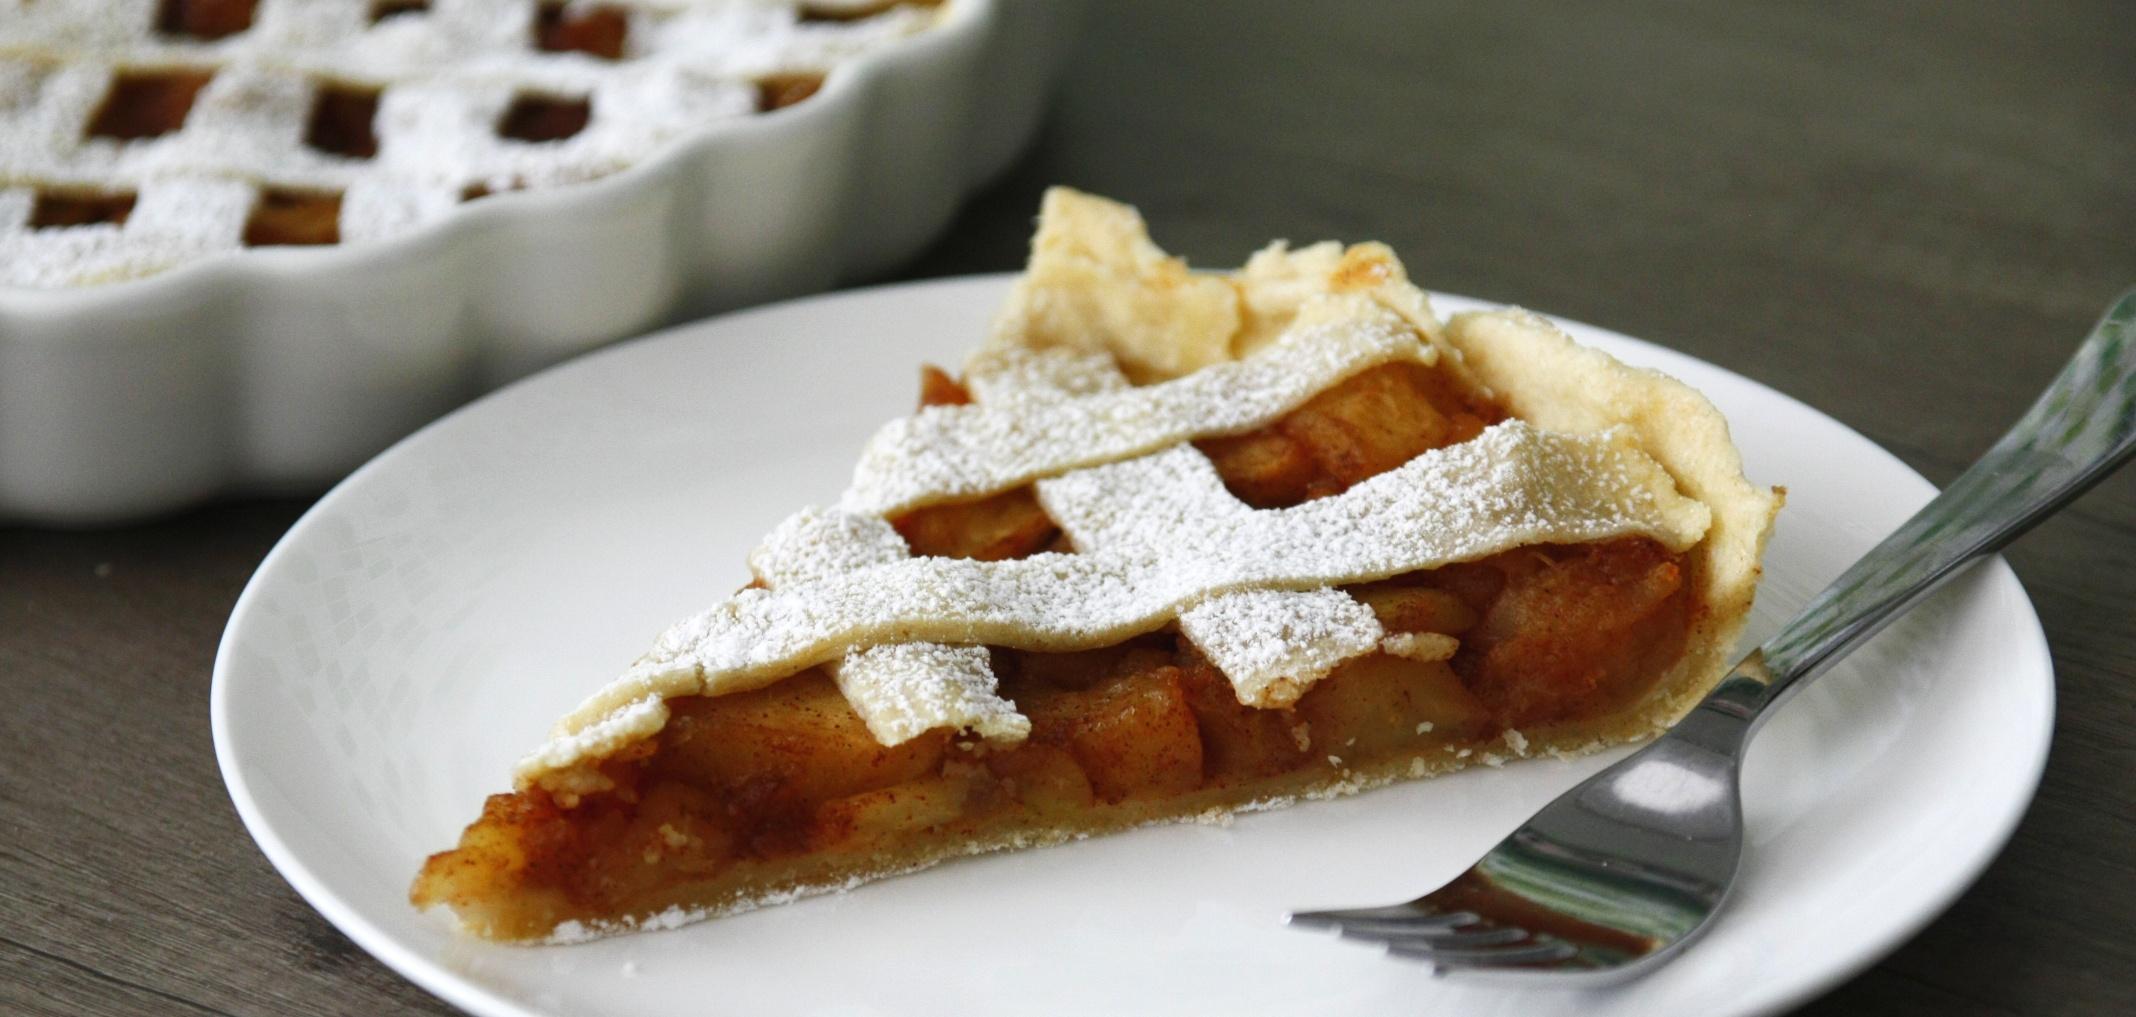 "Apple pie<span class=""badge-status"" style=""background:#5add08"">Vegan</span>"